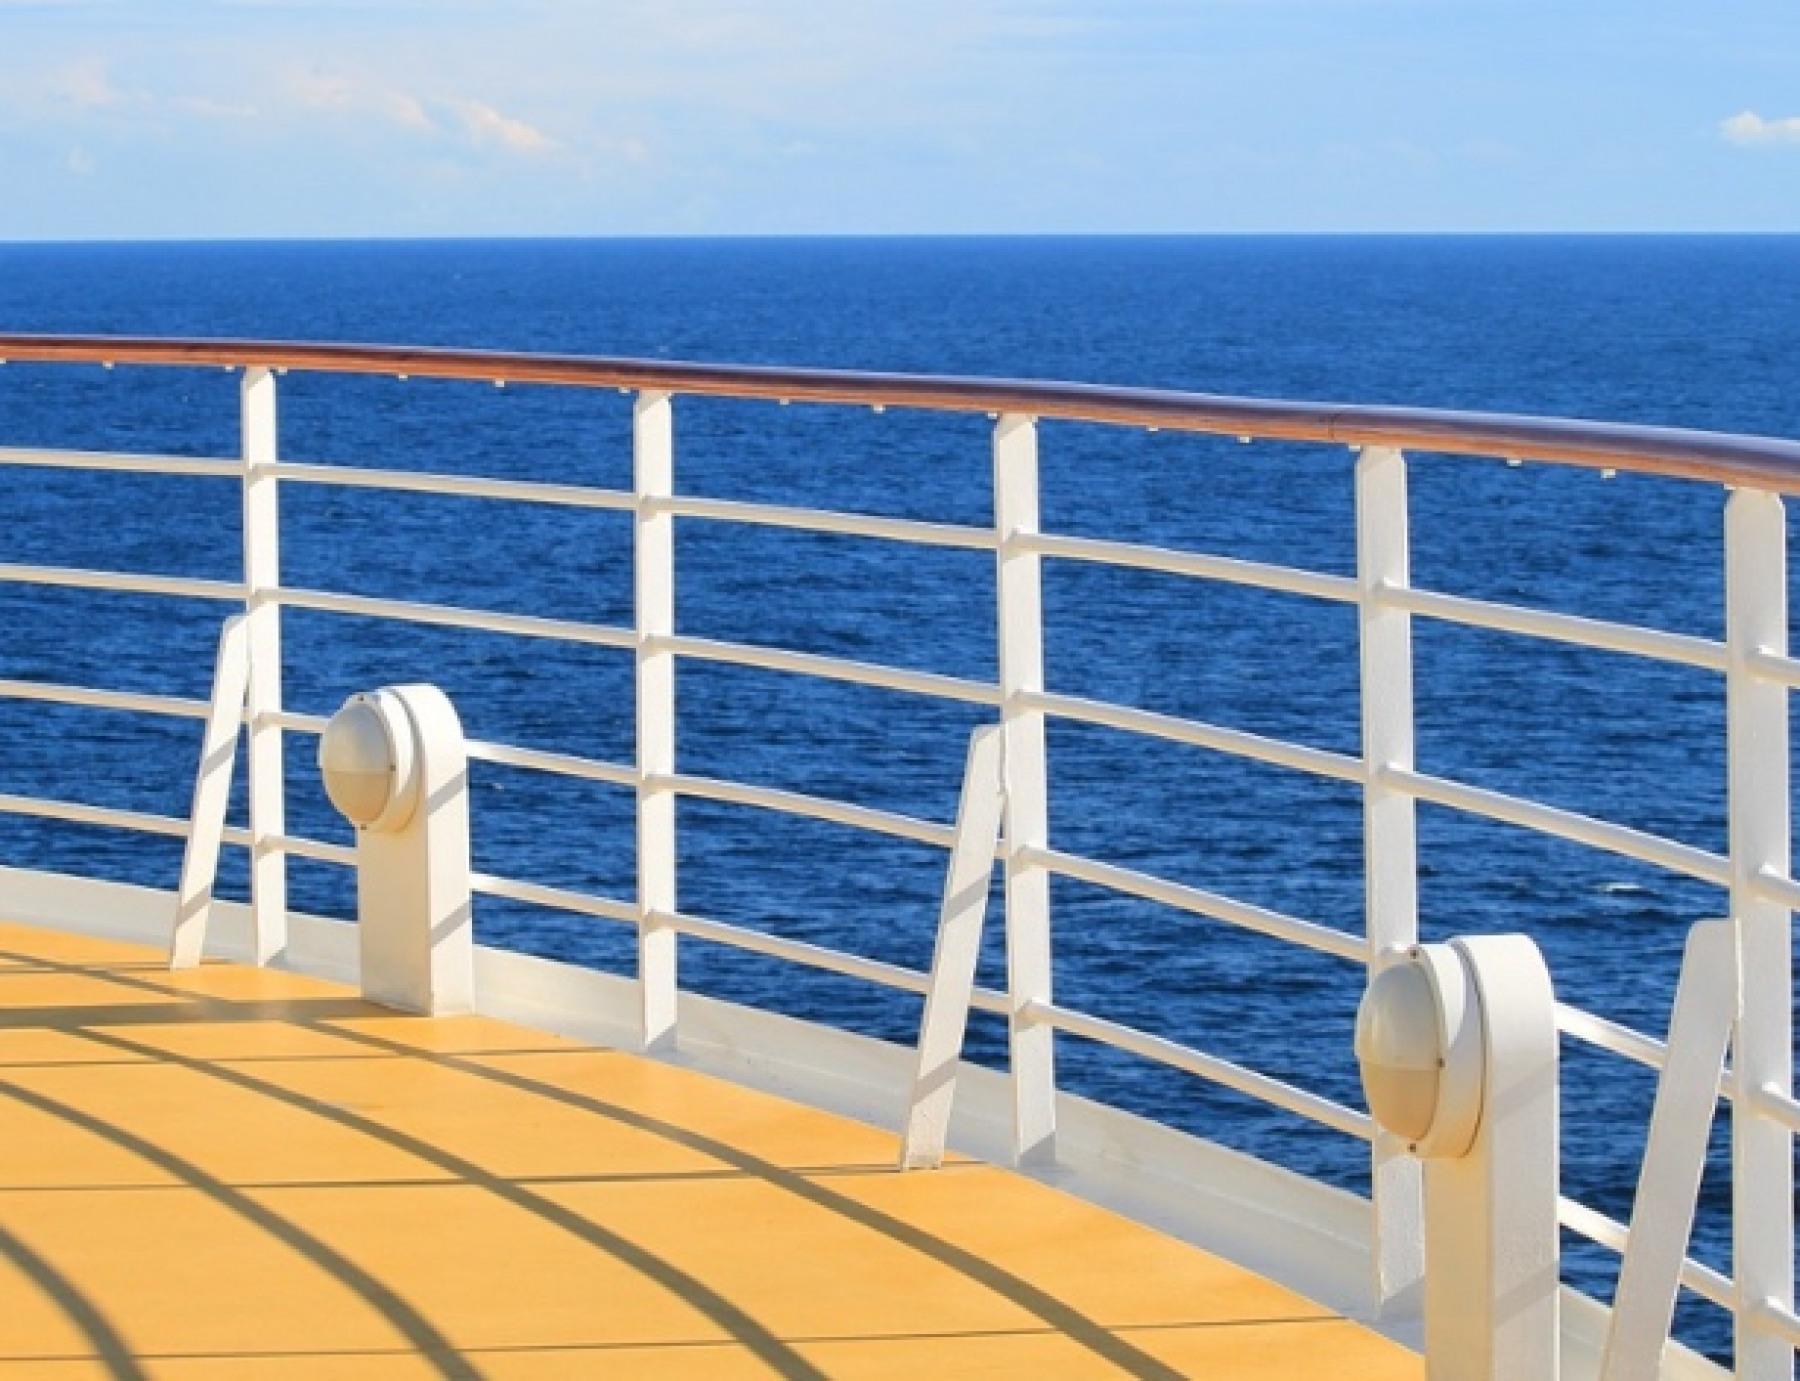 Carnival Cruise Lines Carnival Dream Interiorcoffee-bar-1.jpg